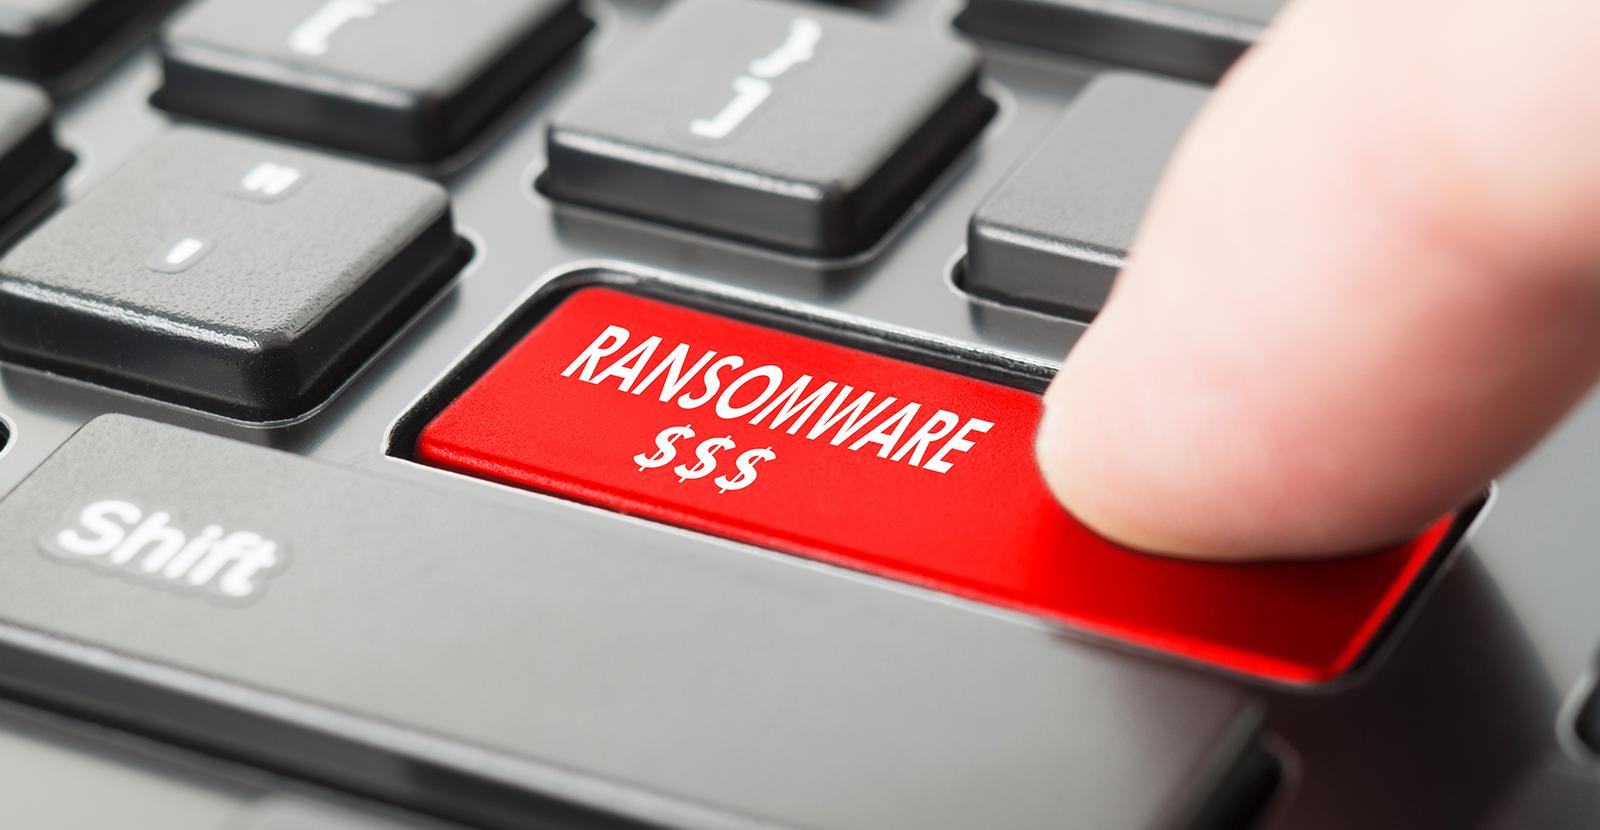 ciberseguridad-ransomware-informacion.png